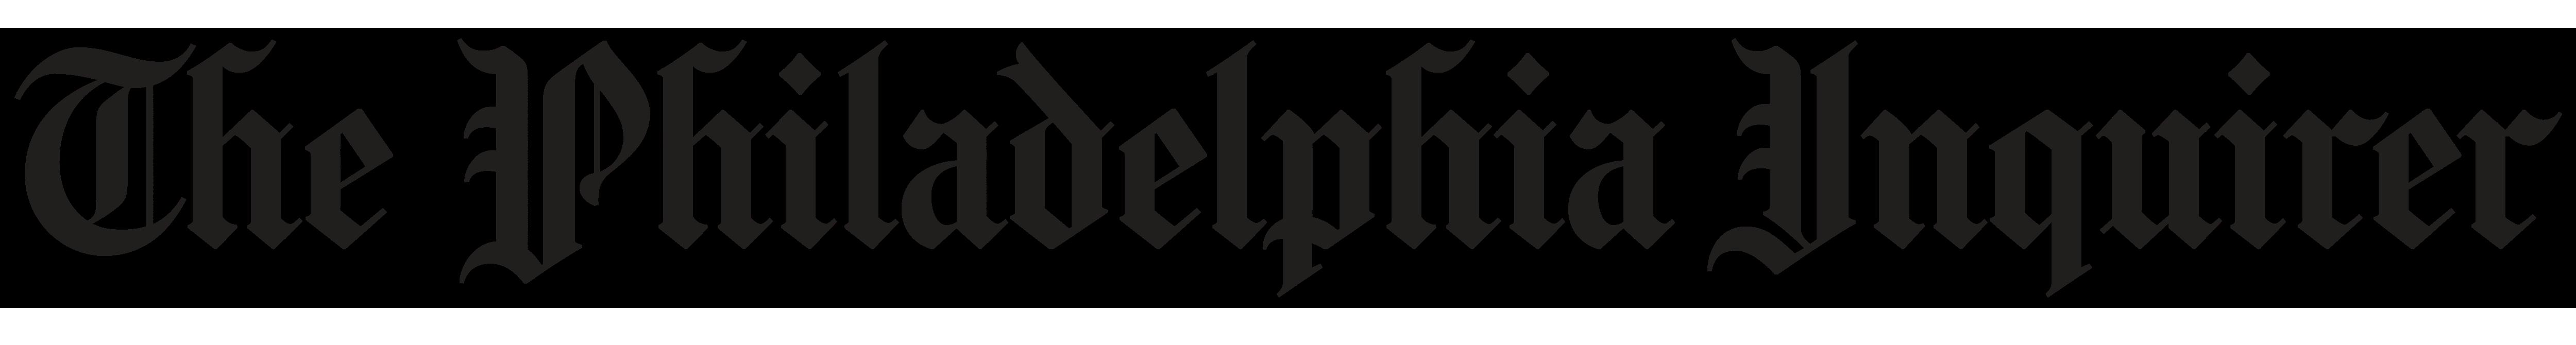 The_Philadelphia_Inquirer_logo_wordmark.